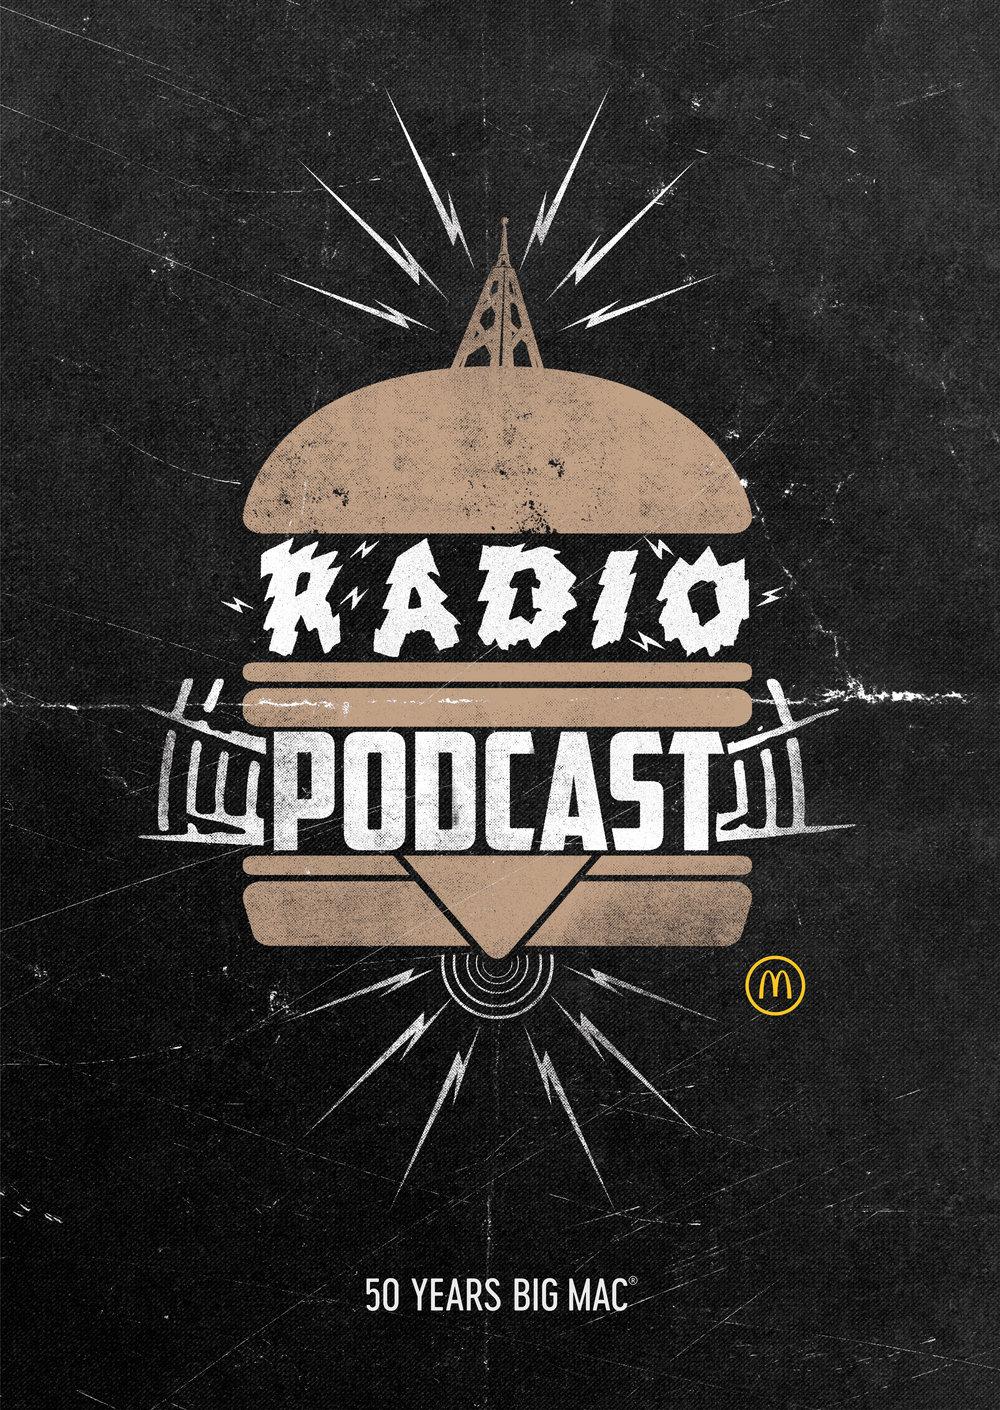 35_Radio:Podcast.jpg